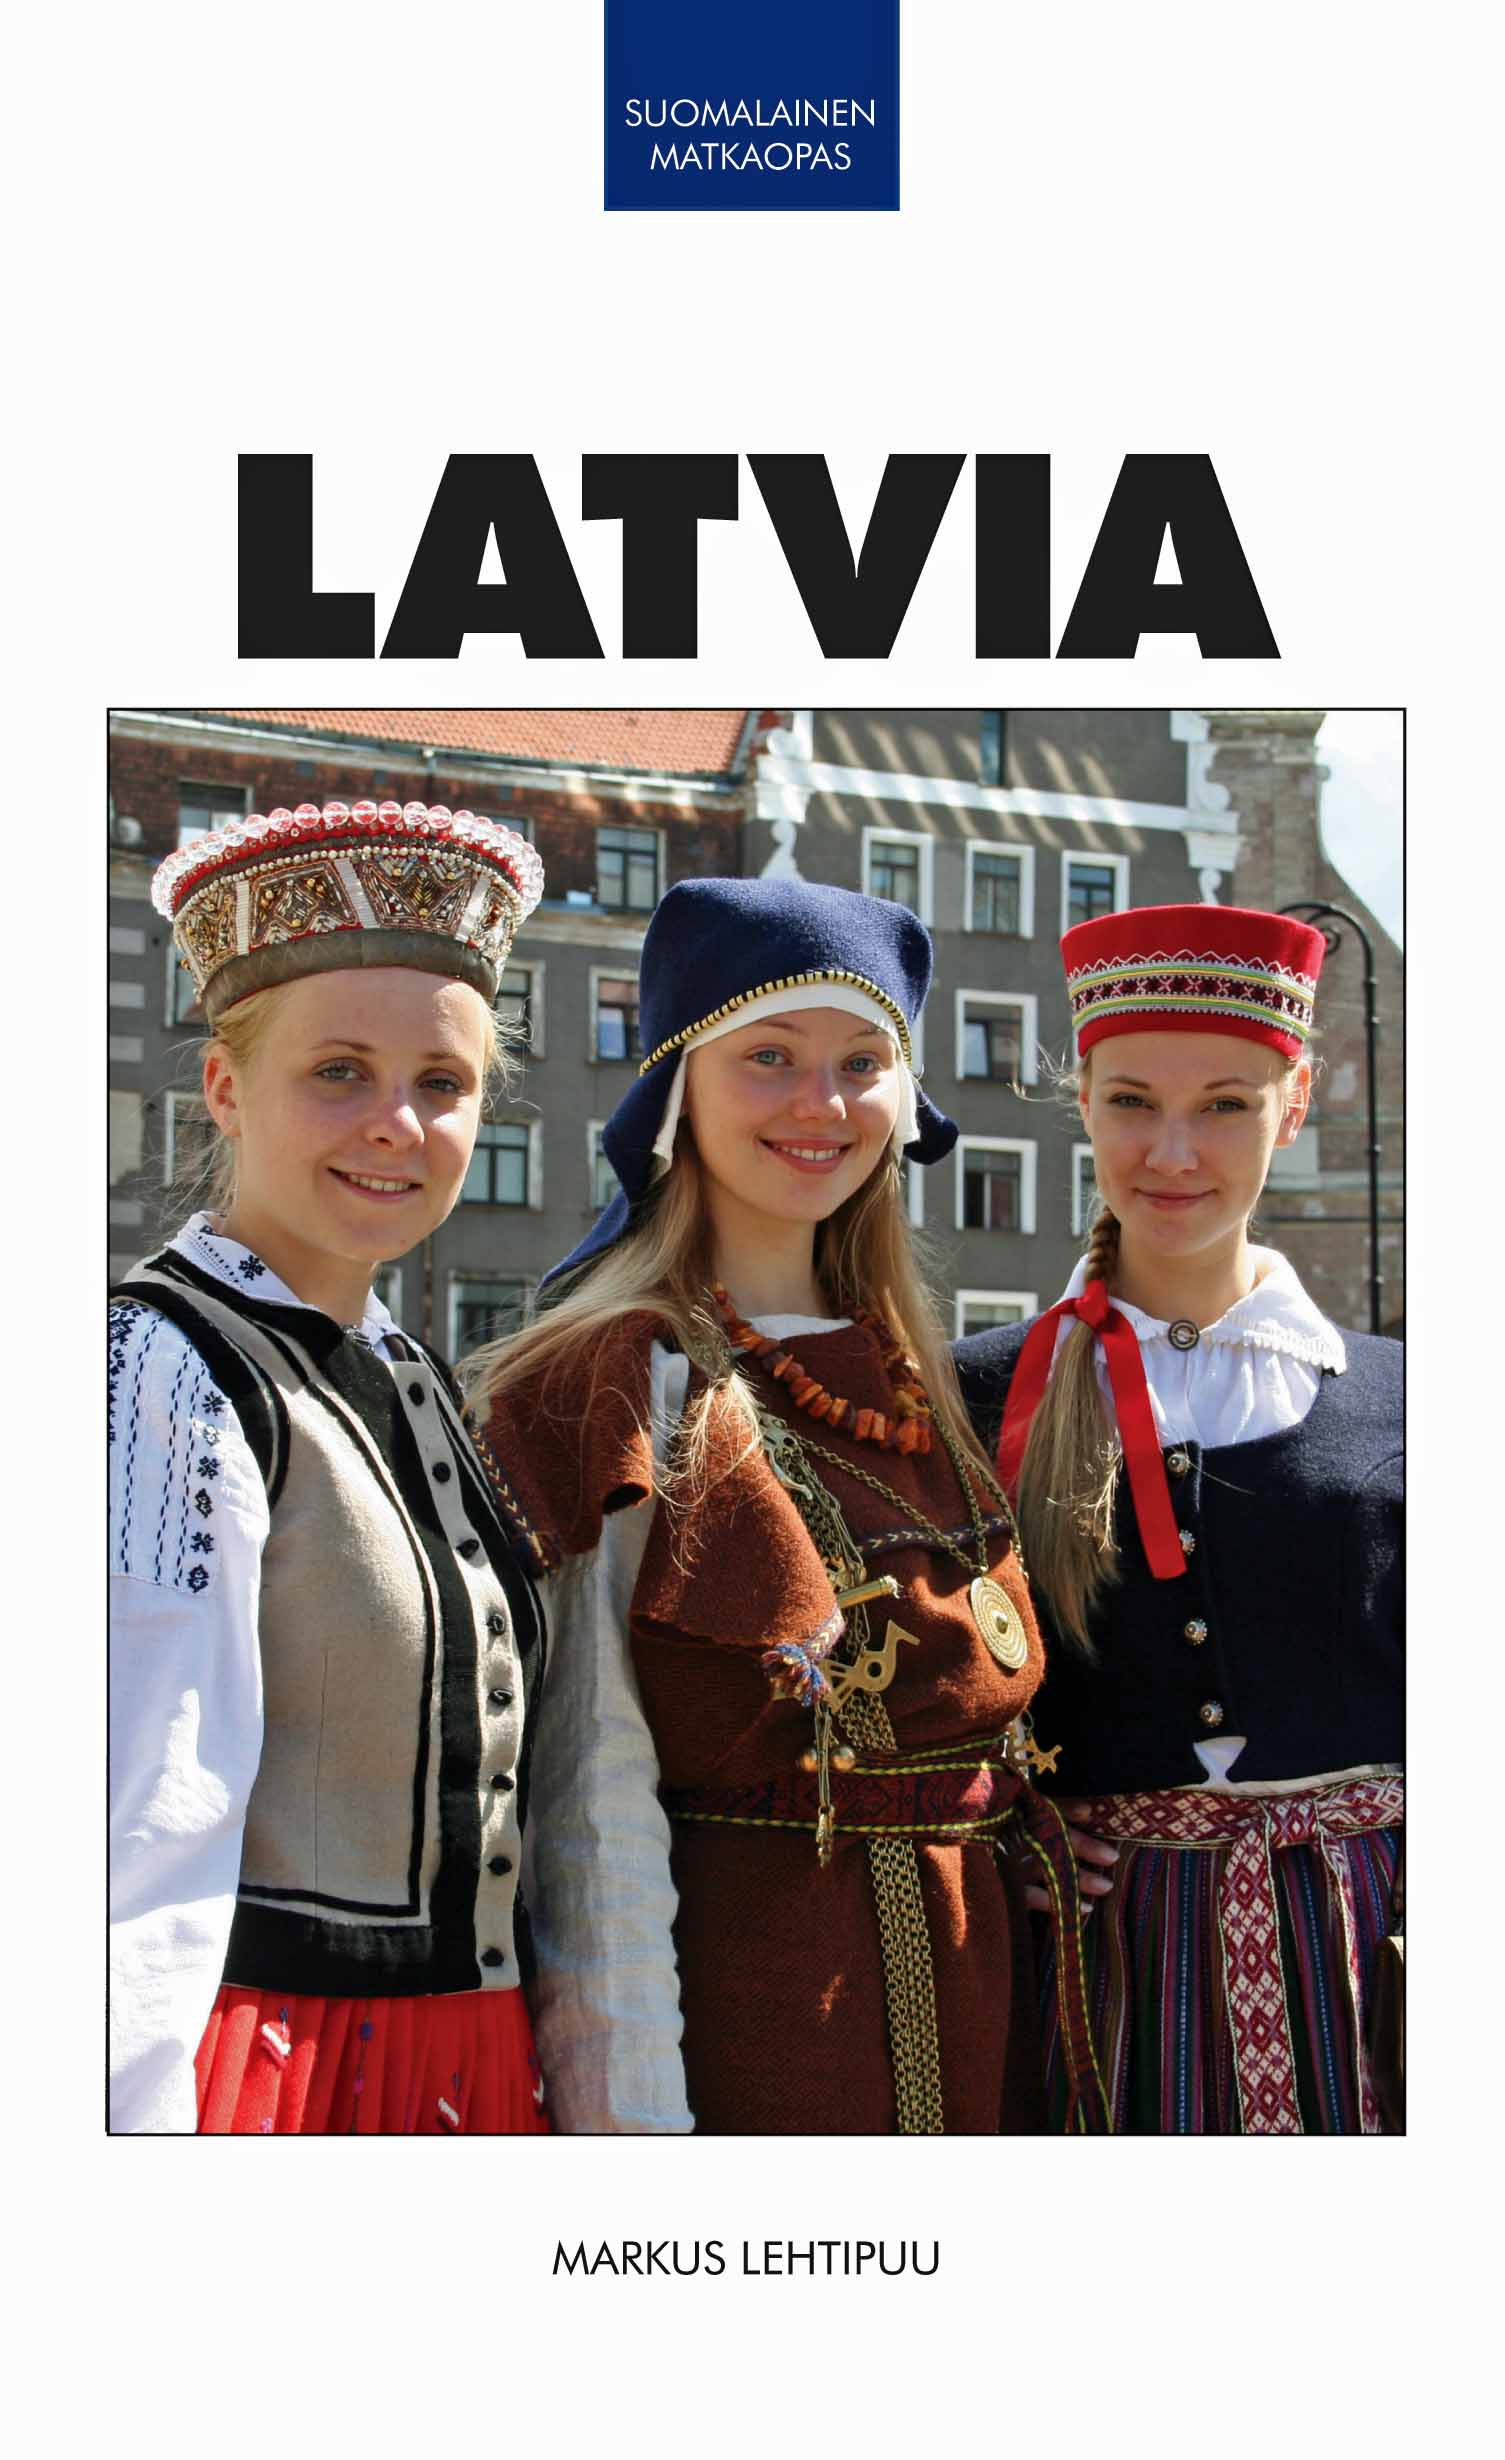 Latvia_lores